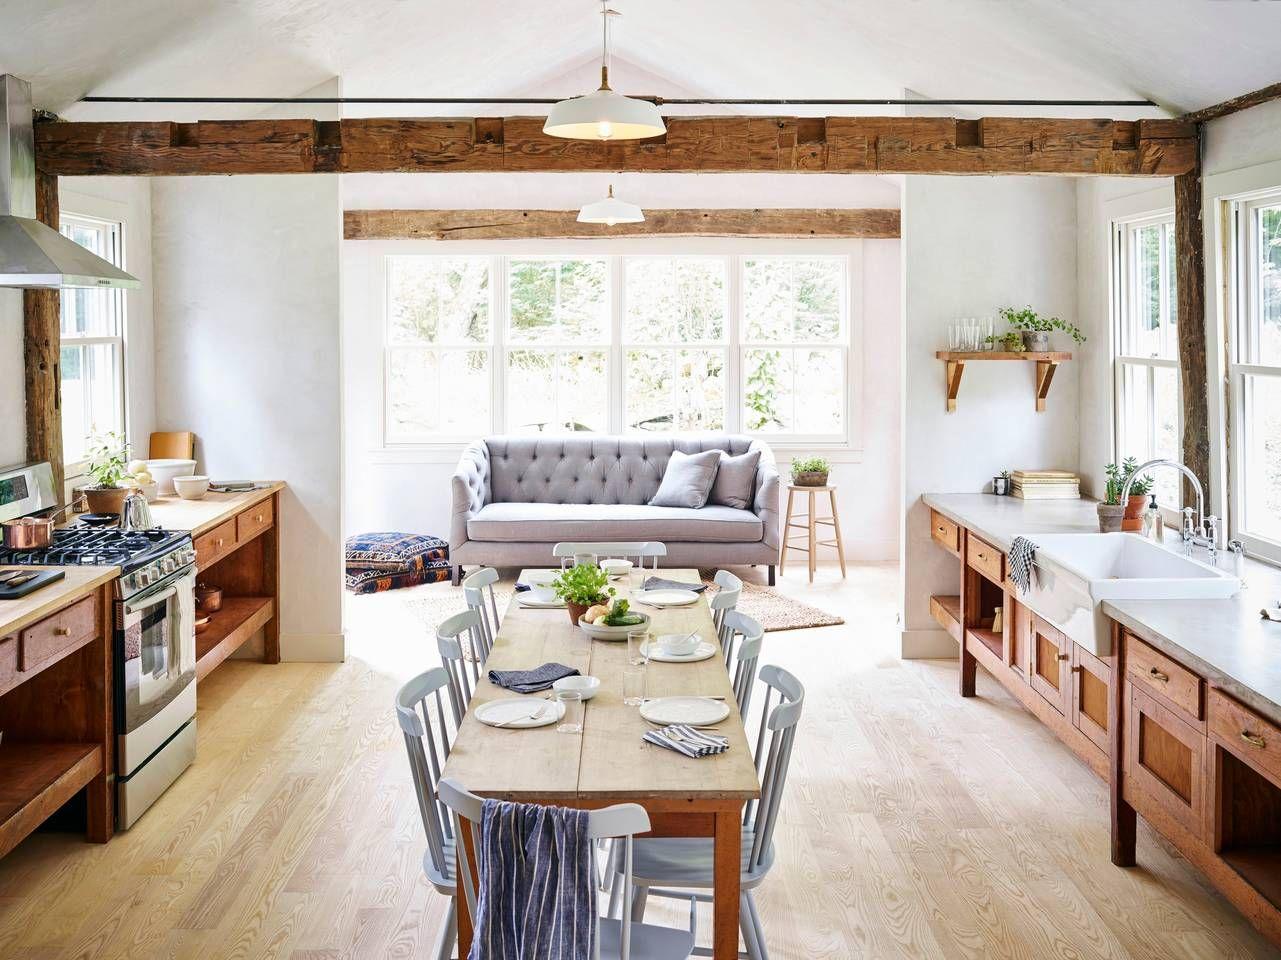 Monterey country house - Houses for Rent in Monterey, Massachusetts ...